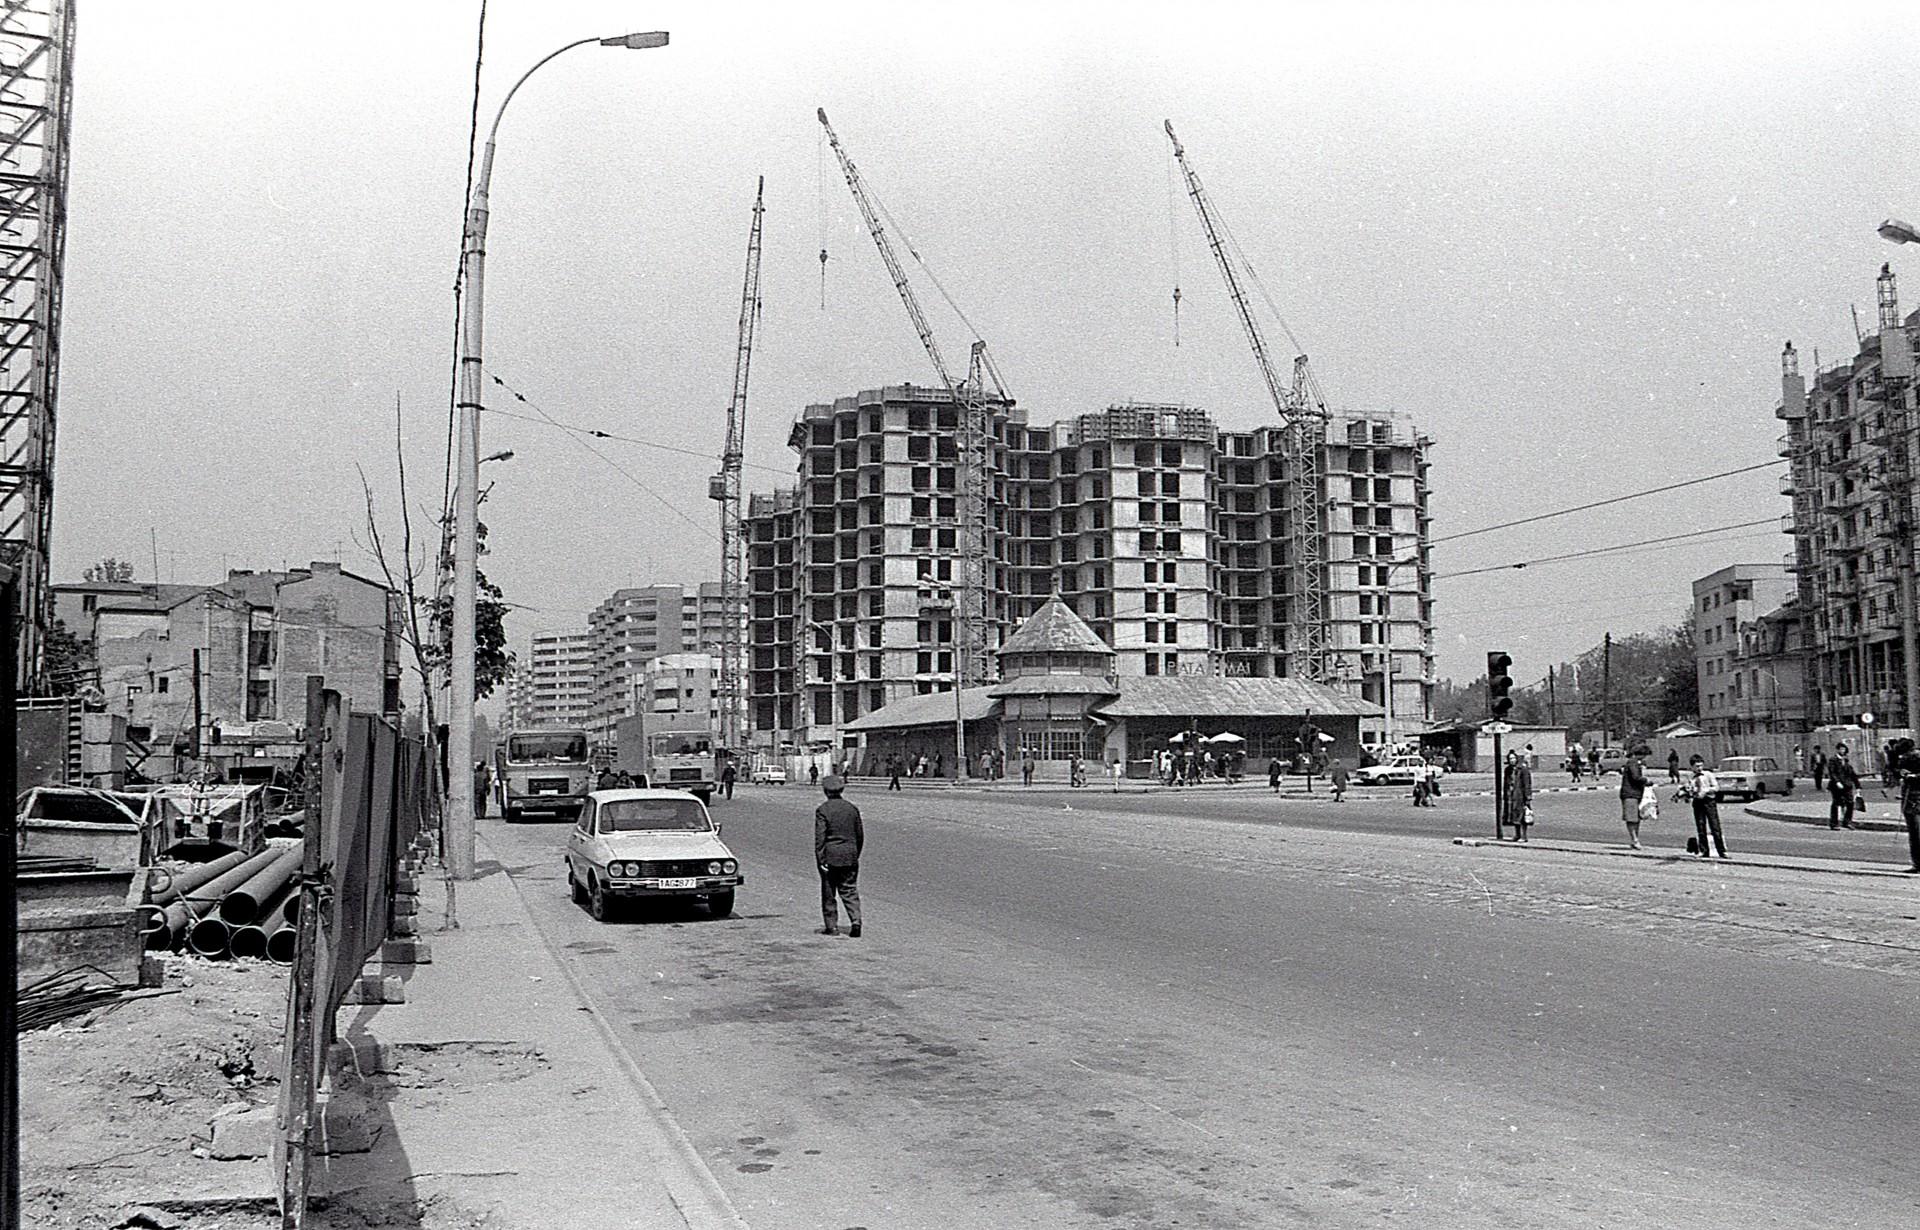 Piata 1 Mai Si Blocul 40 In Constructie Bulevardul Ion Mihalache